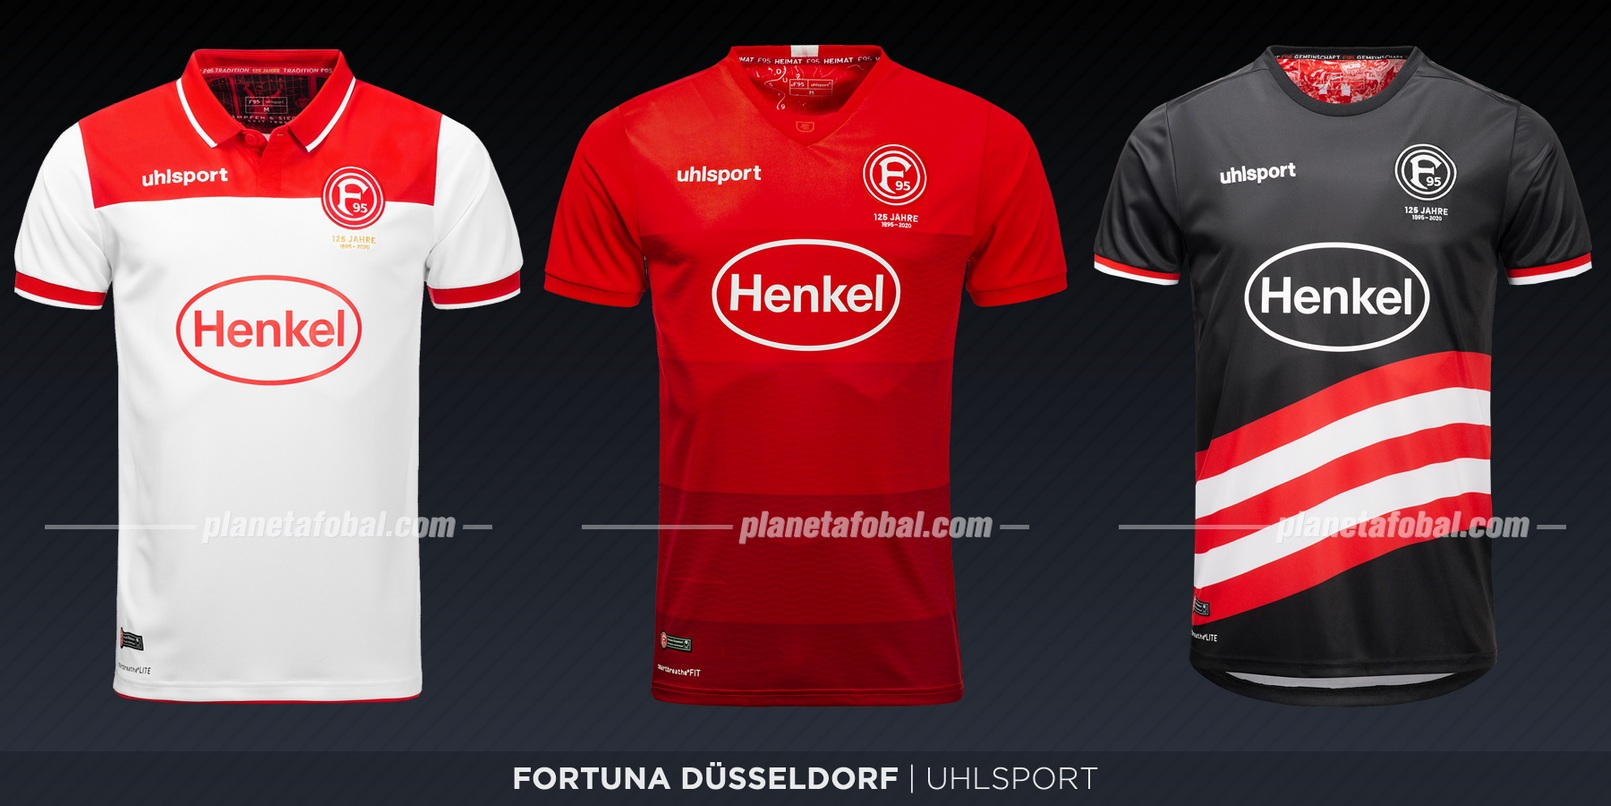 Fortuna Düsseldorf (Uhlsport) | Camisetas de la Bundesliga 2019-2020